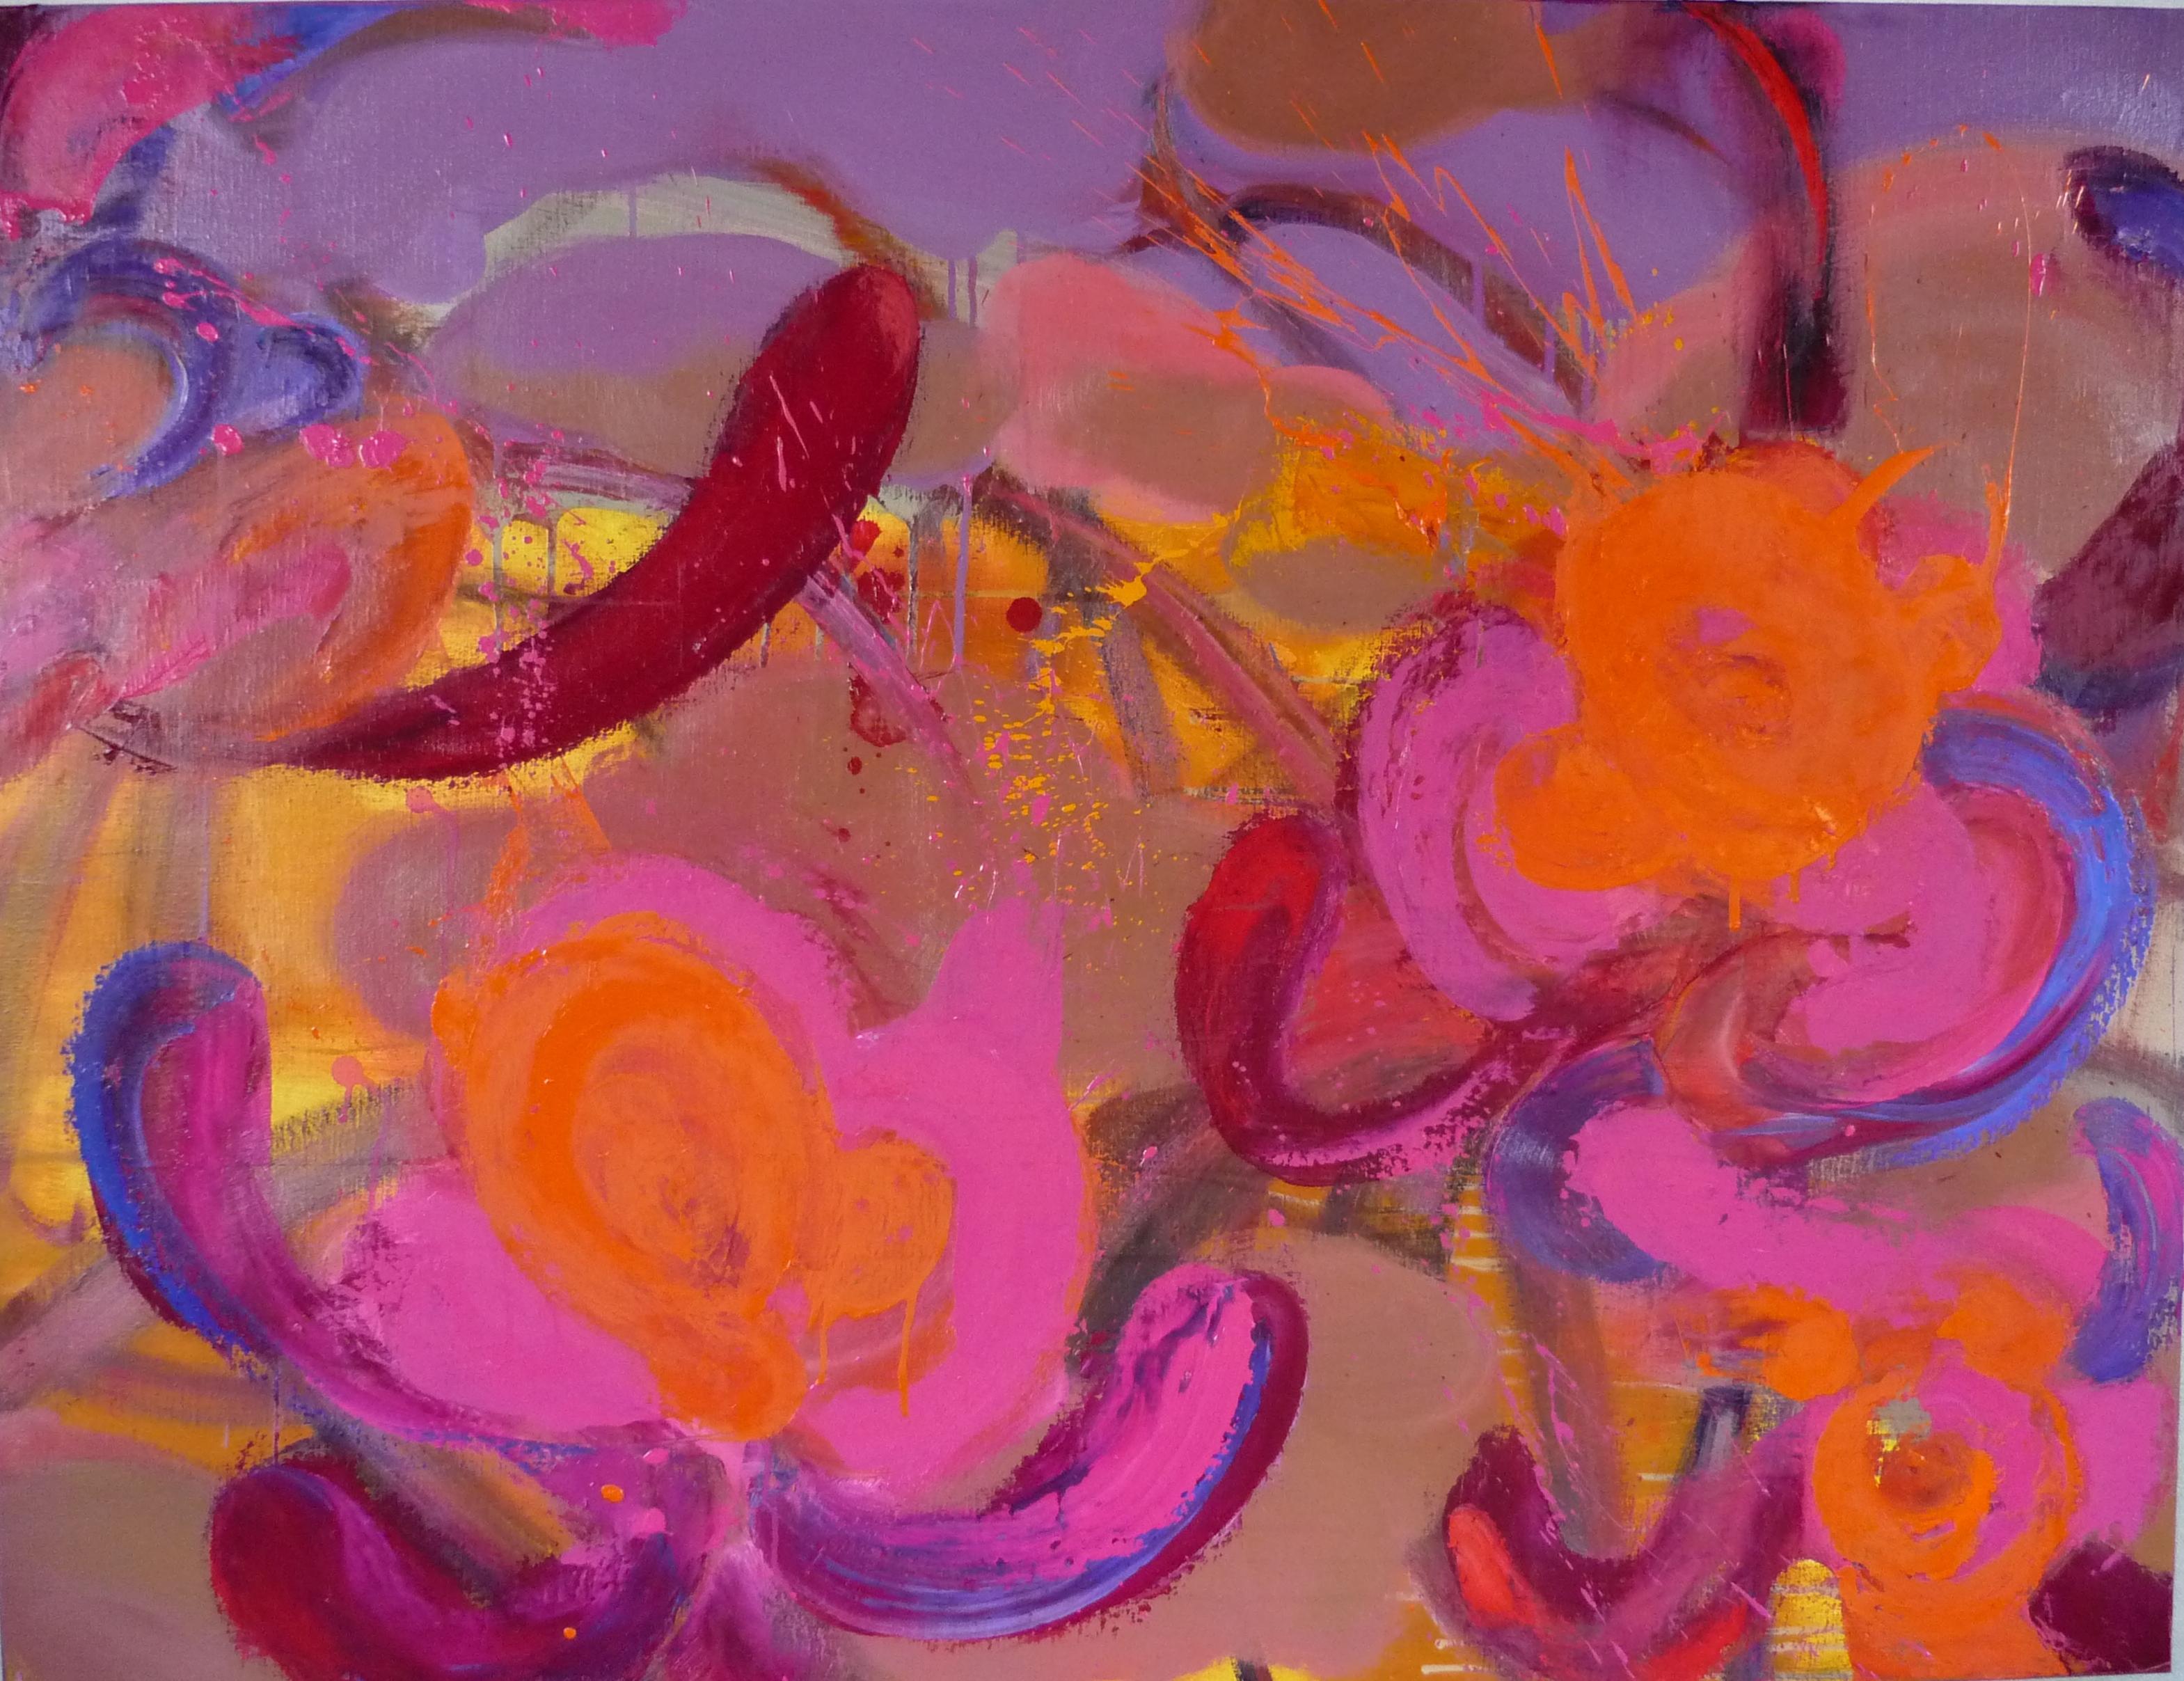 Bonnet d'Evêque (Spindle) - flower painting, bright colors, orange, pink and red